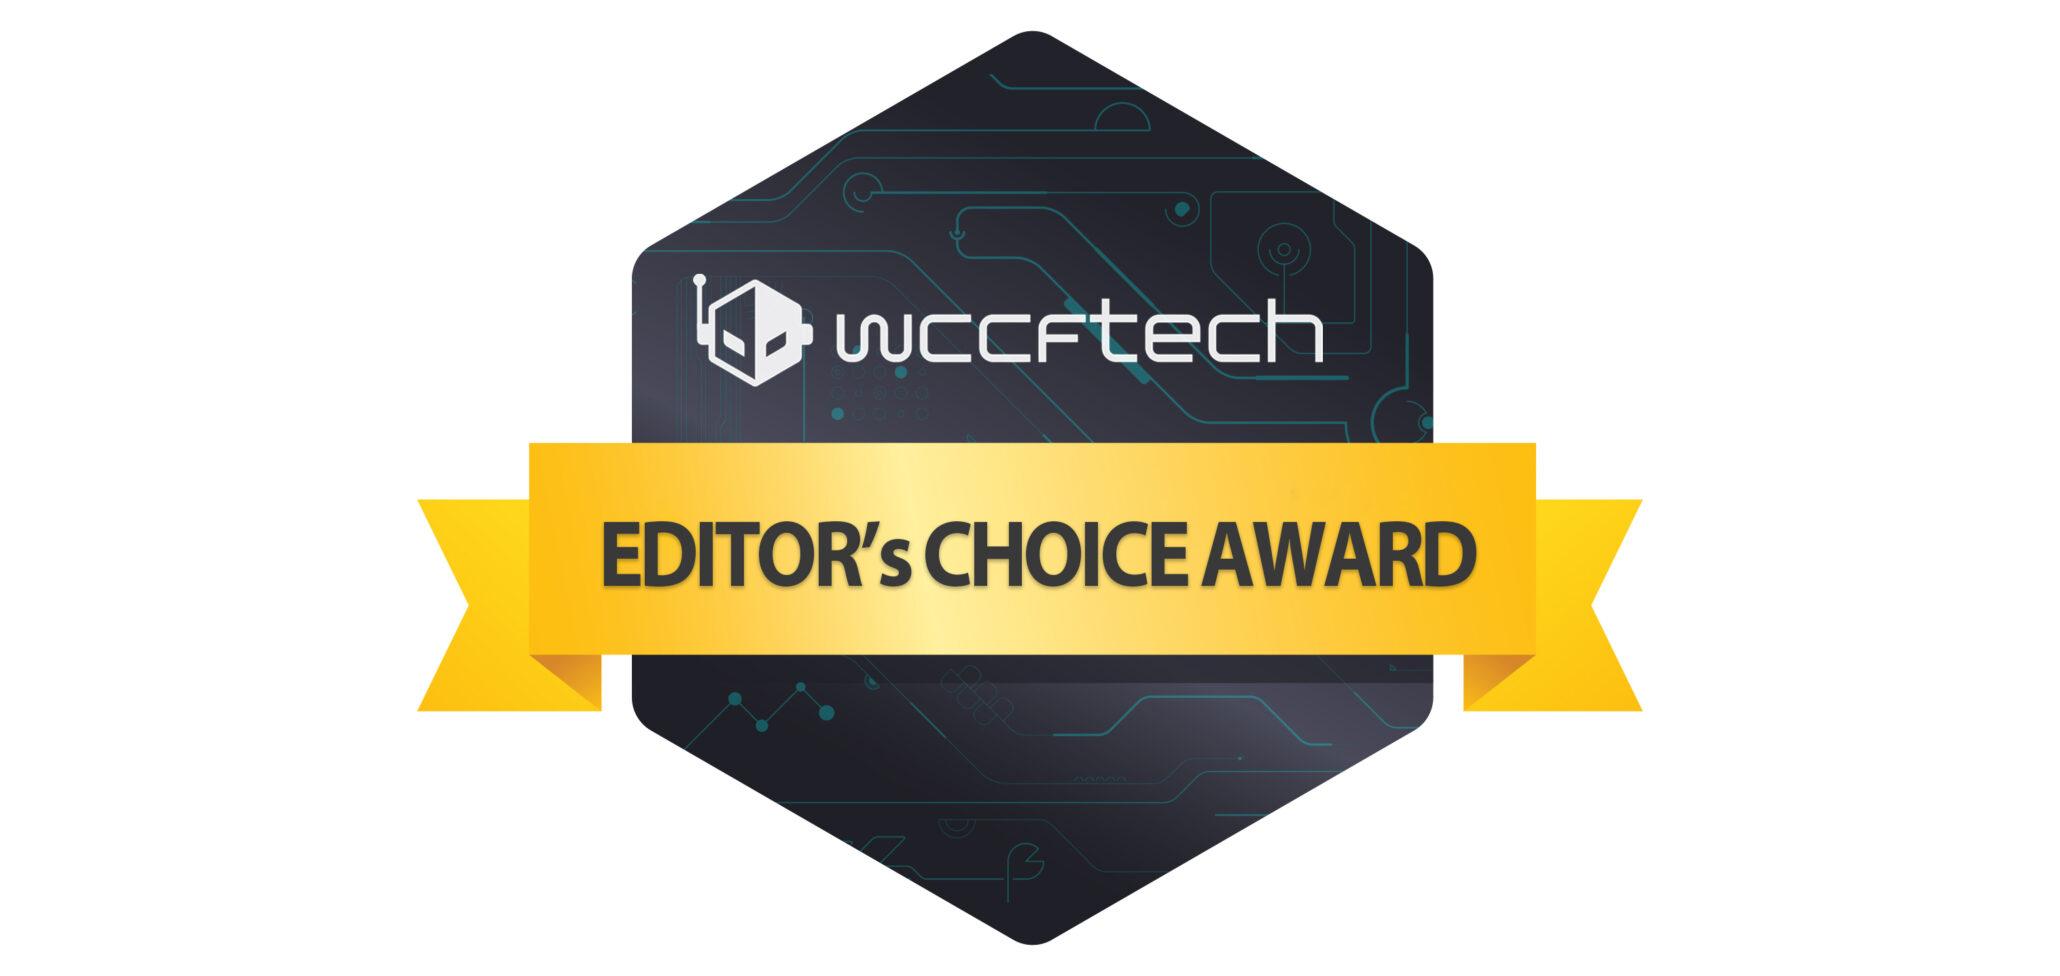 wccftech-awards-export